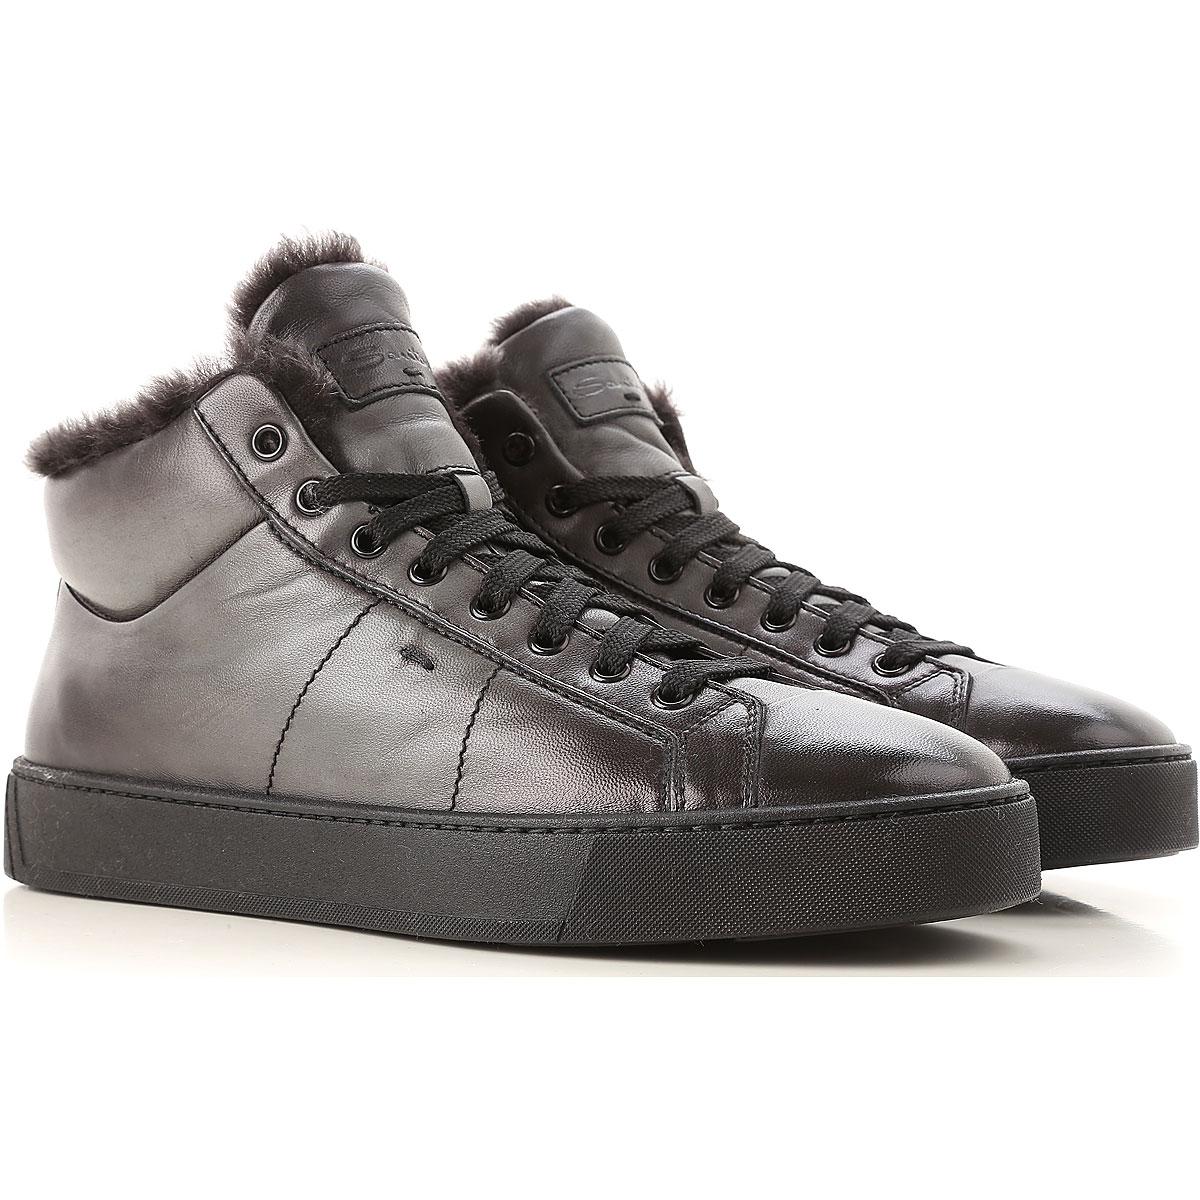 Image of Santoni Boots for Men, Booties, Dark Grey, Leather, 2017, 10 10.5 11 12 13 7 7.5 8 8.5